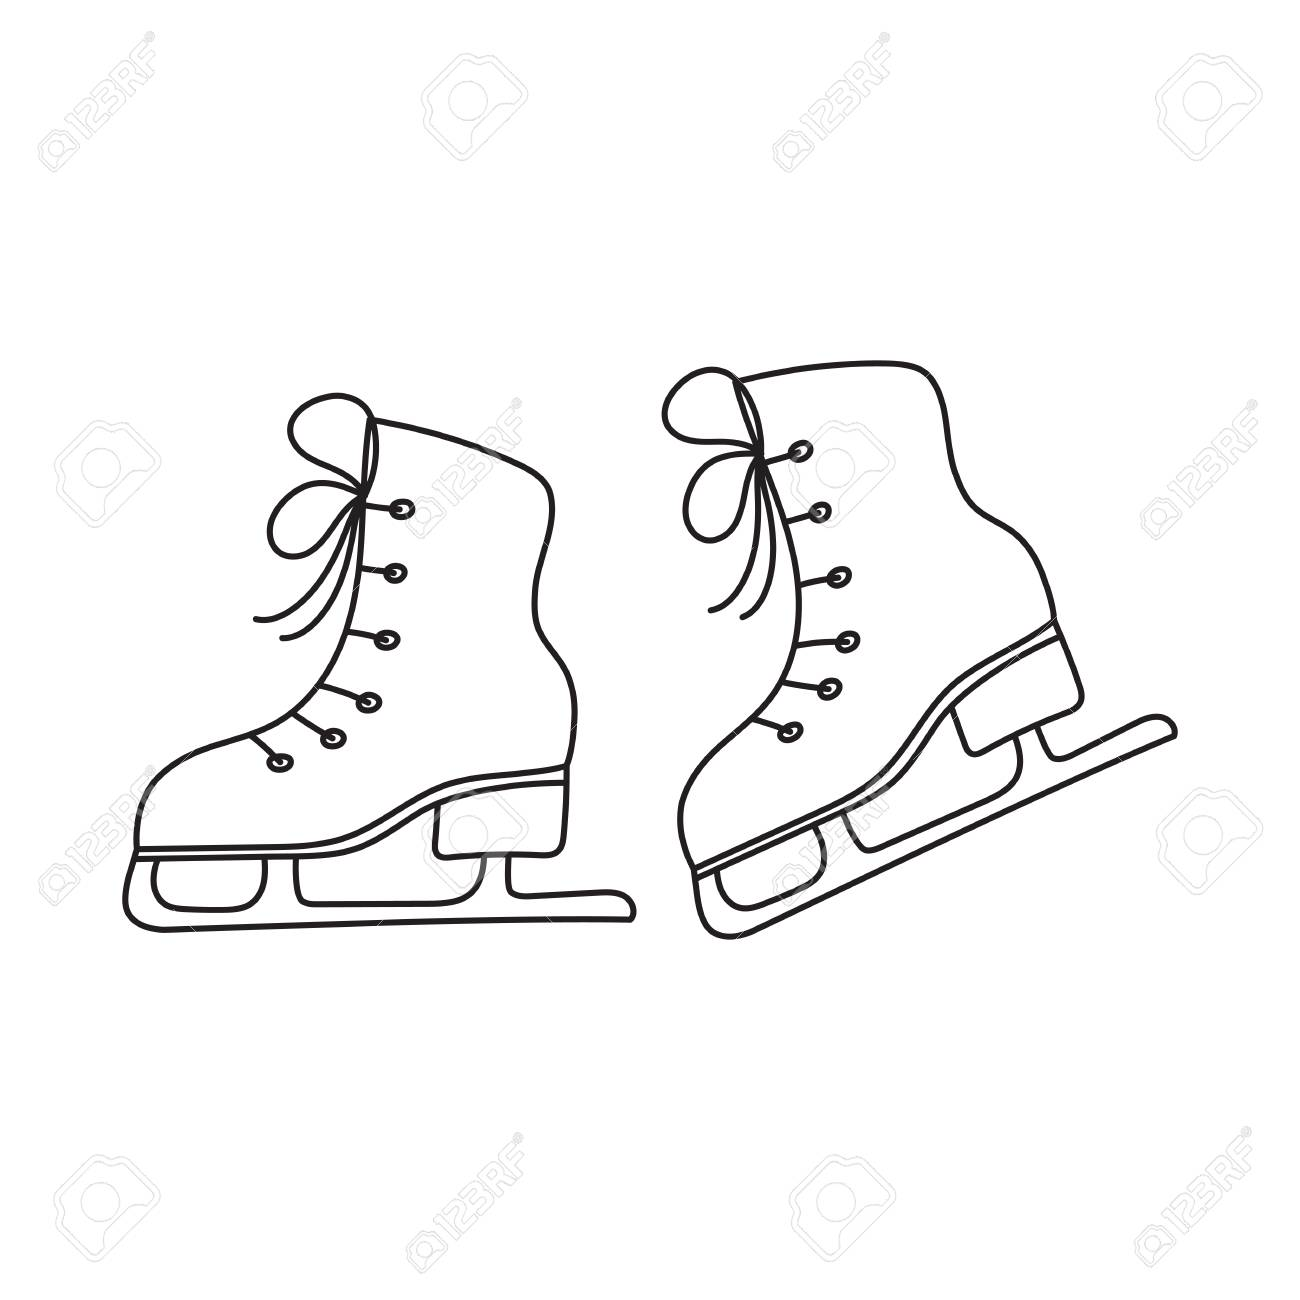 1300x1300 Ice Skates Vector Line Illustration Isolated On White Background